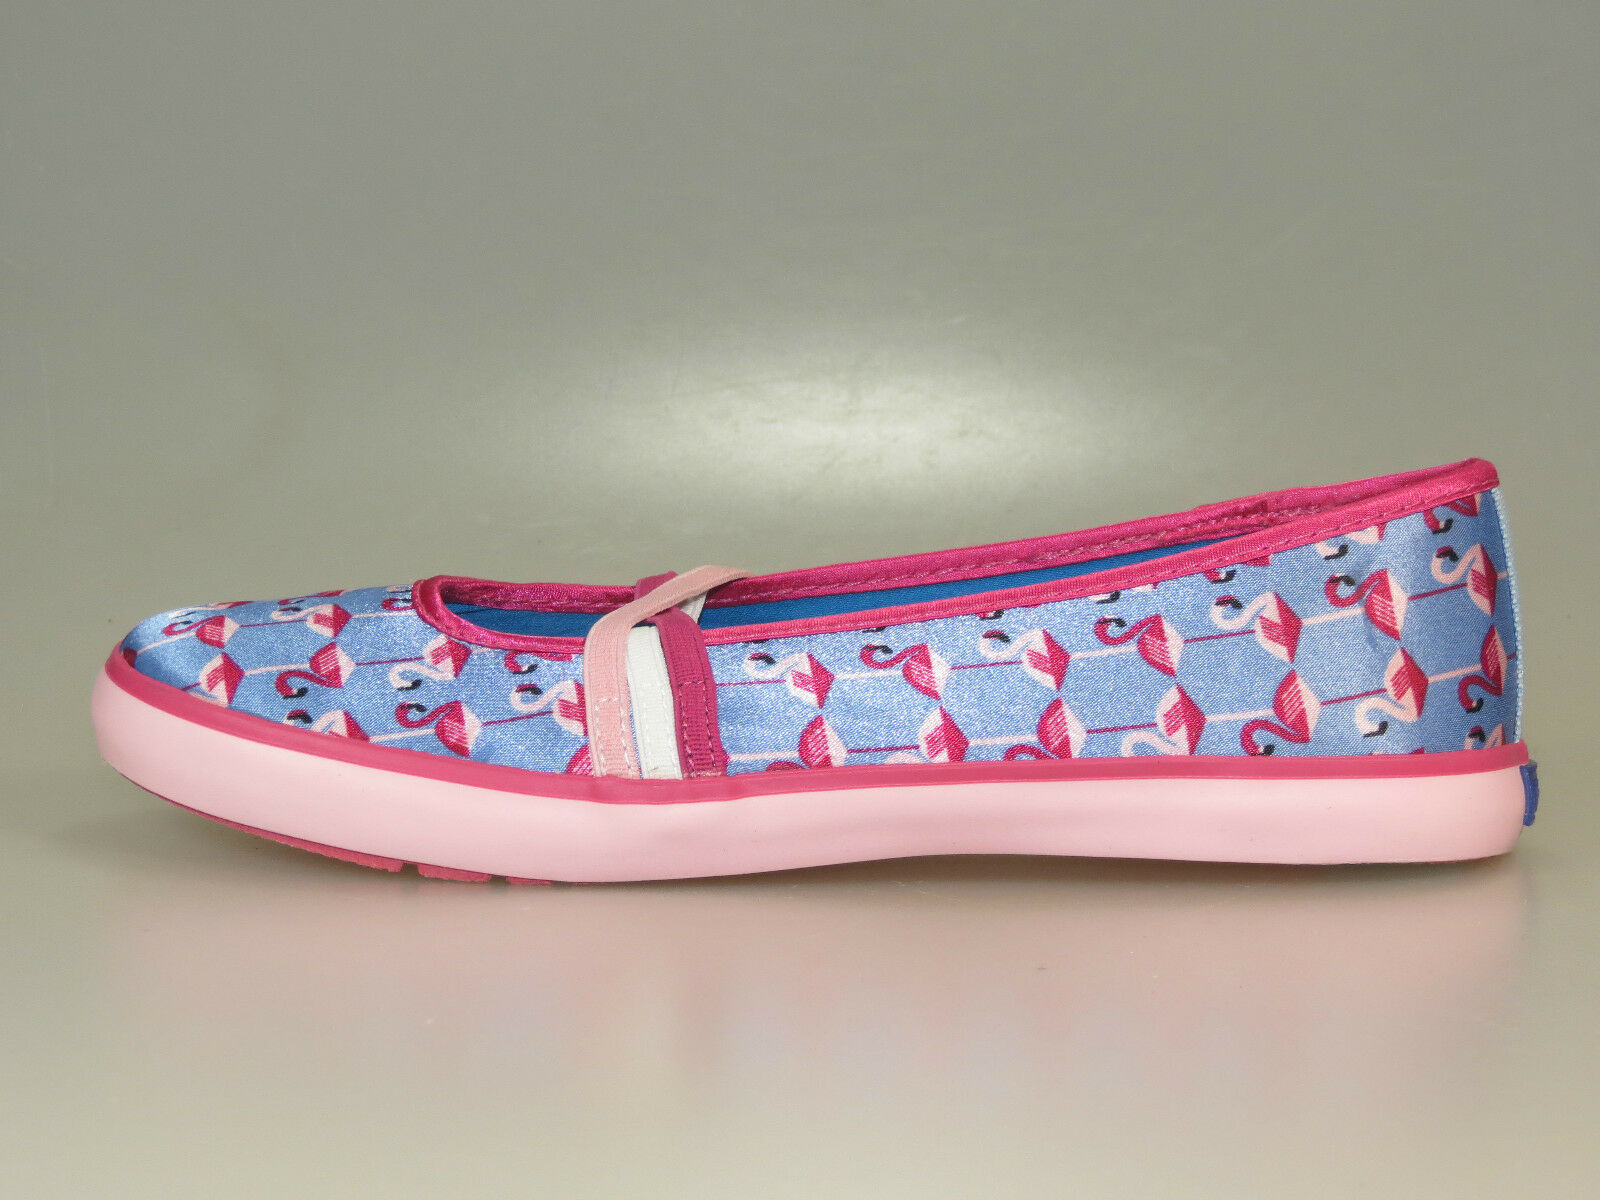 Keds Ballerinas Women BB ´s Eleanor Pink bluee Flamingo wf24412 +NEW+ ALL SIZES